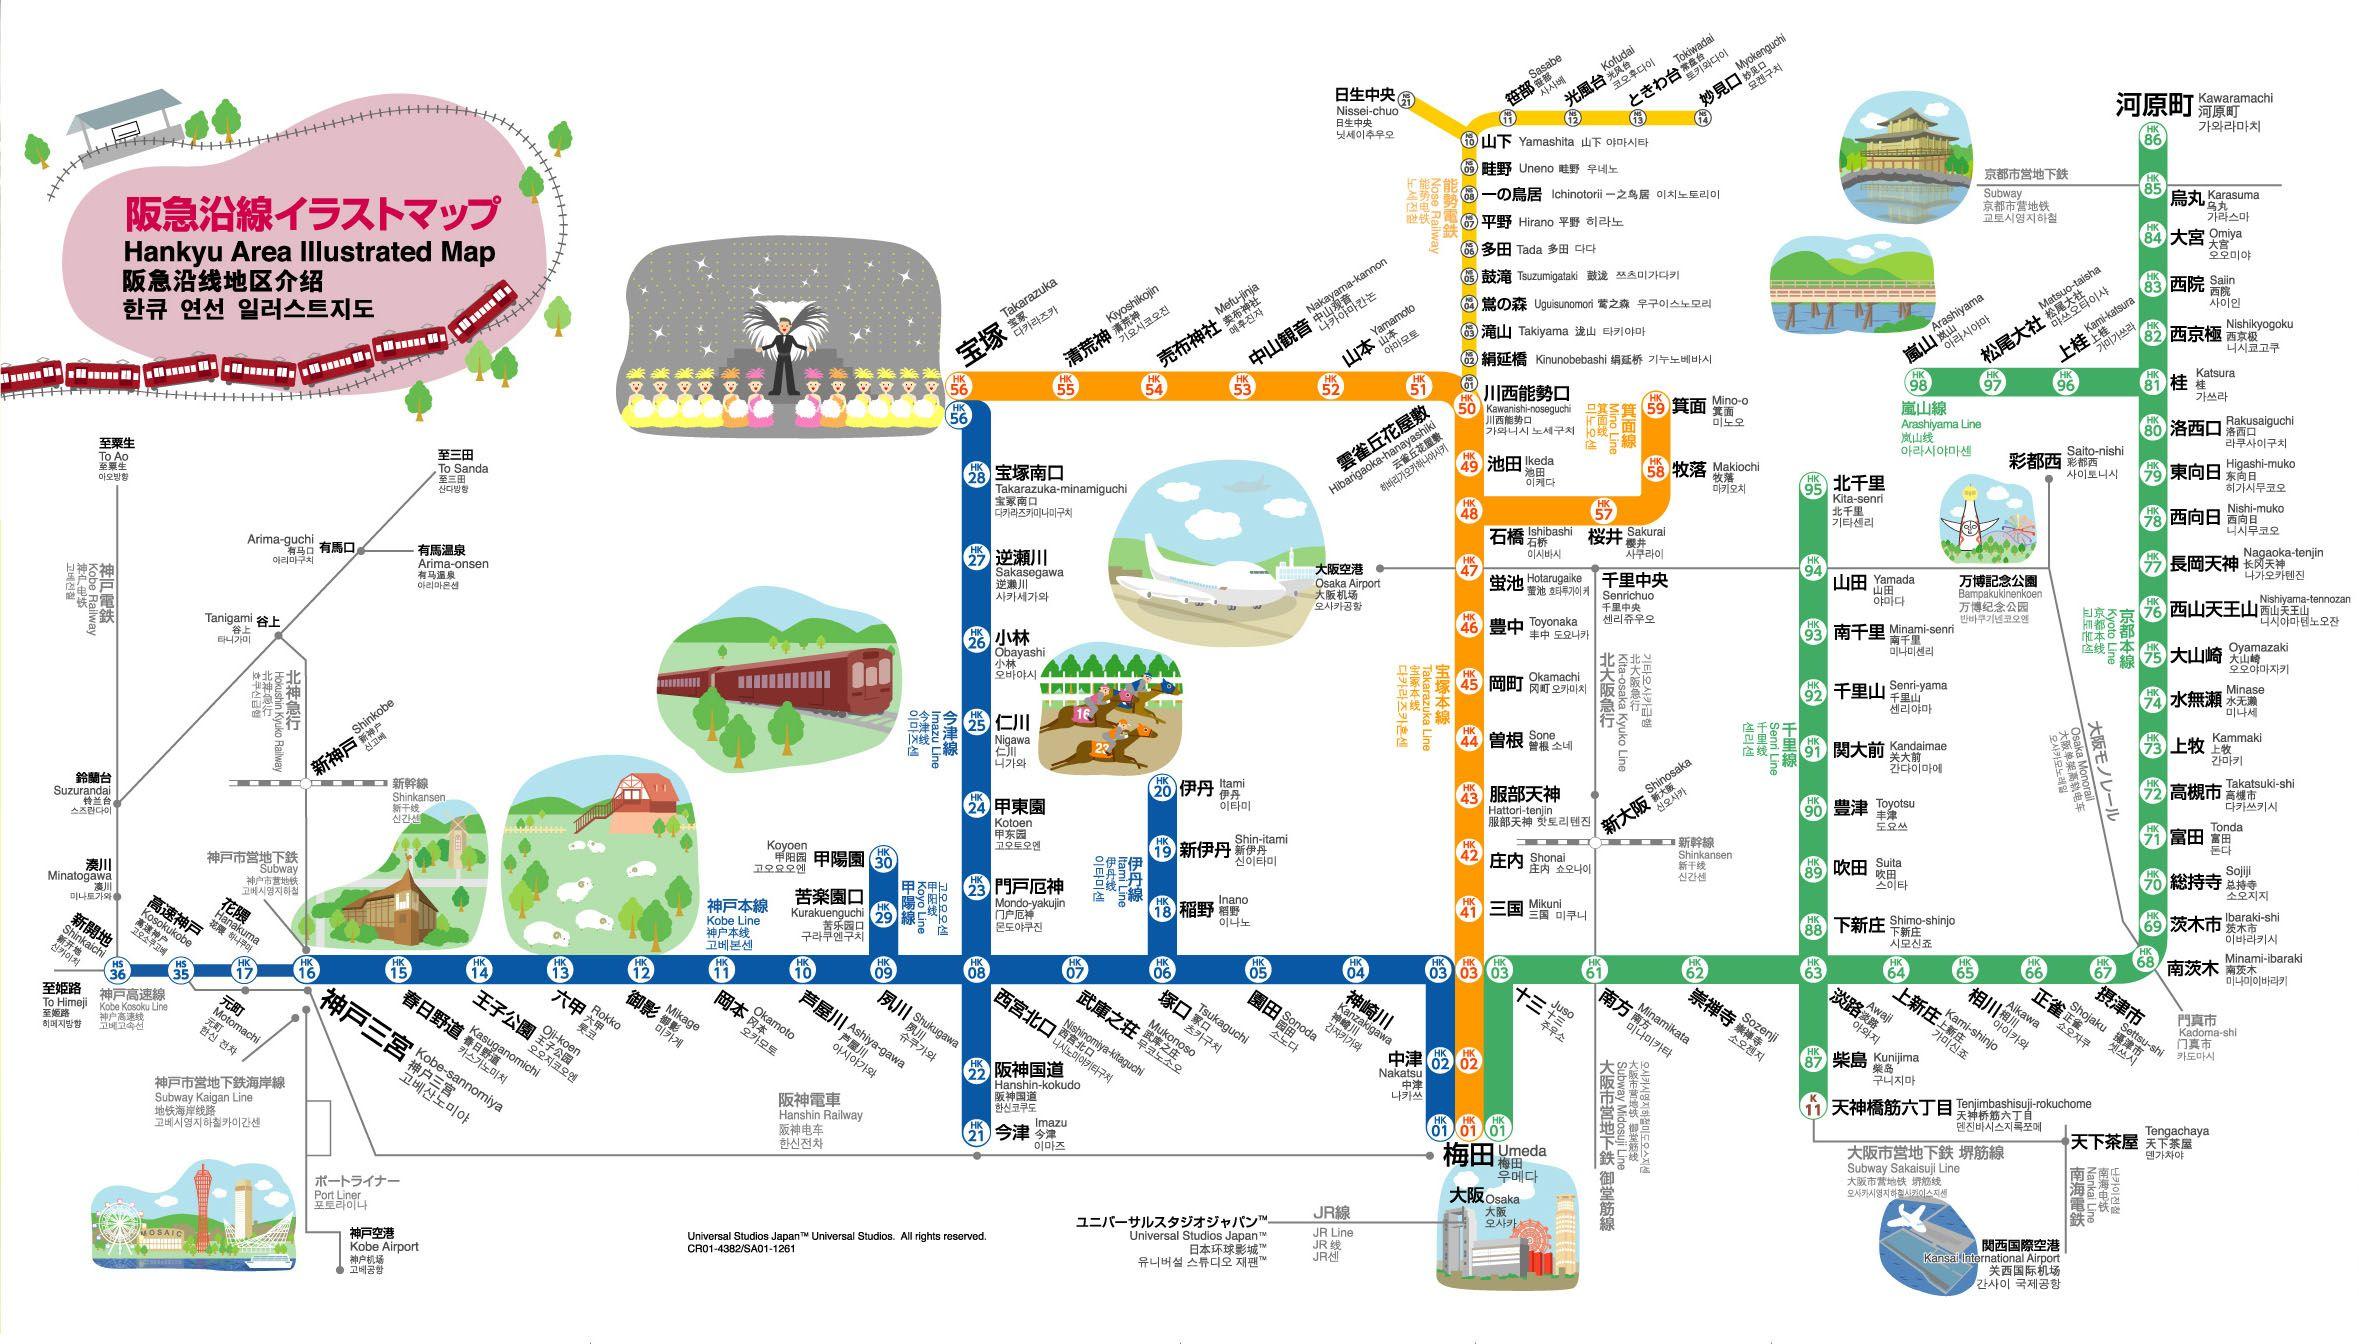 Hankyu Illustrated Map Kyoto Subway Subway Map Trip Planning